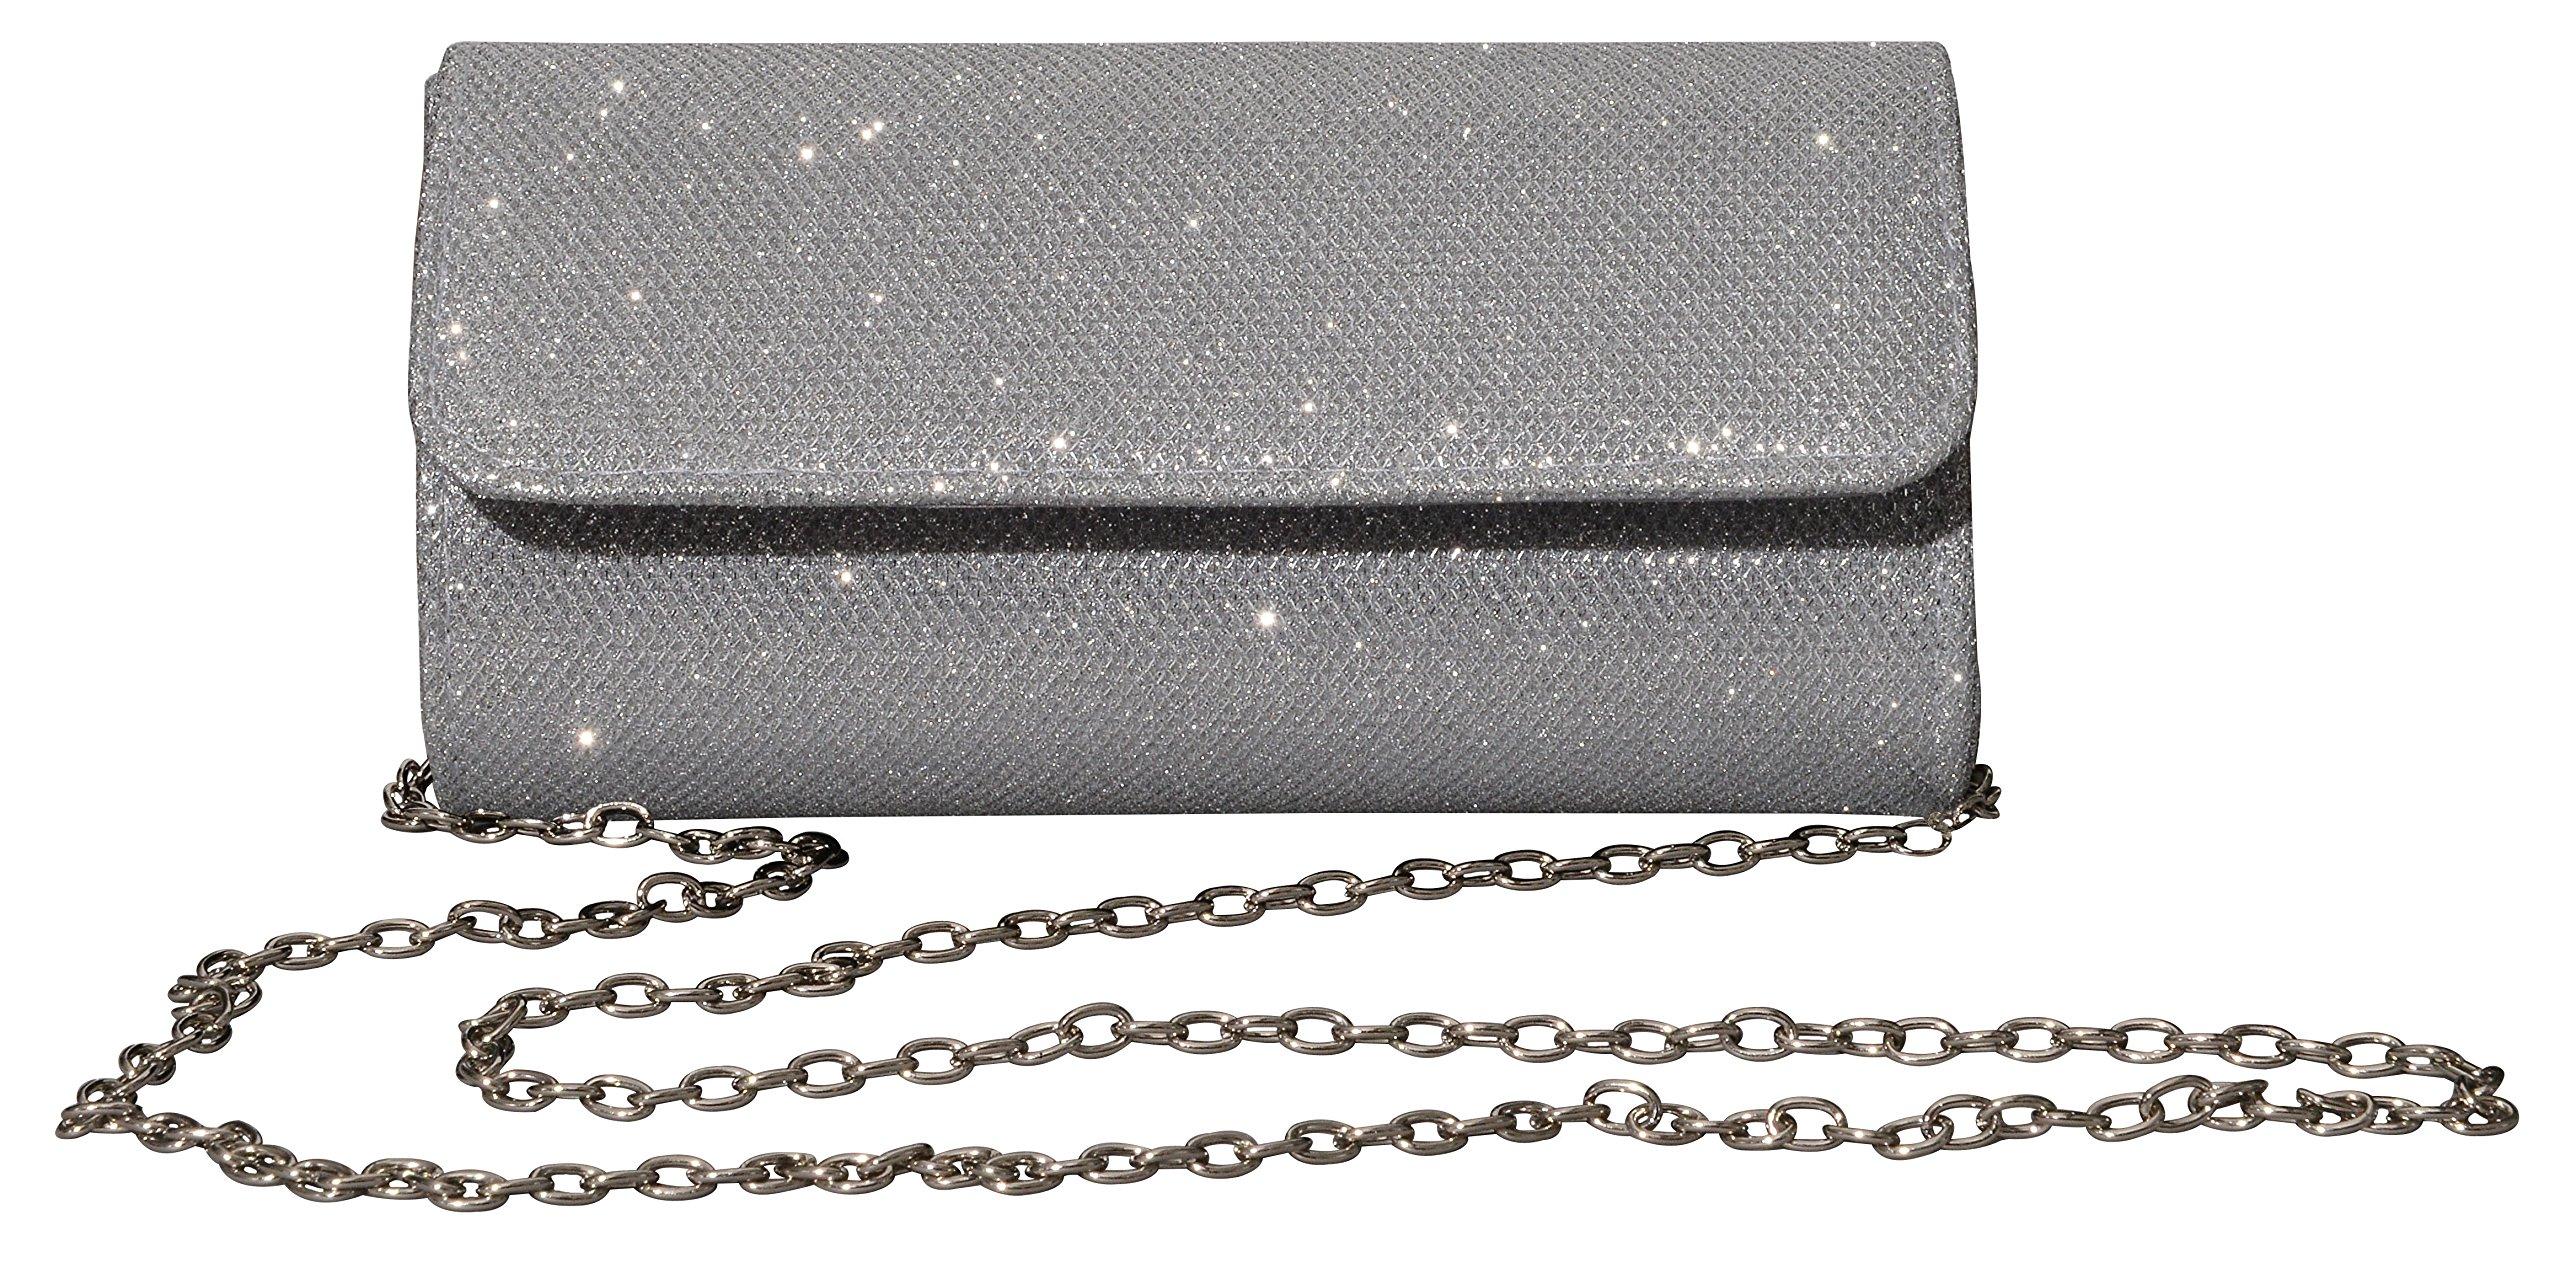 Outrip Women's Evening Bag Clutch Purse Glitter Party Wedding Handbag with Chain (Silver)